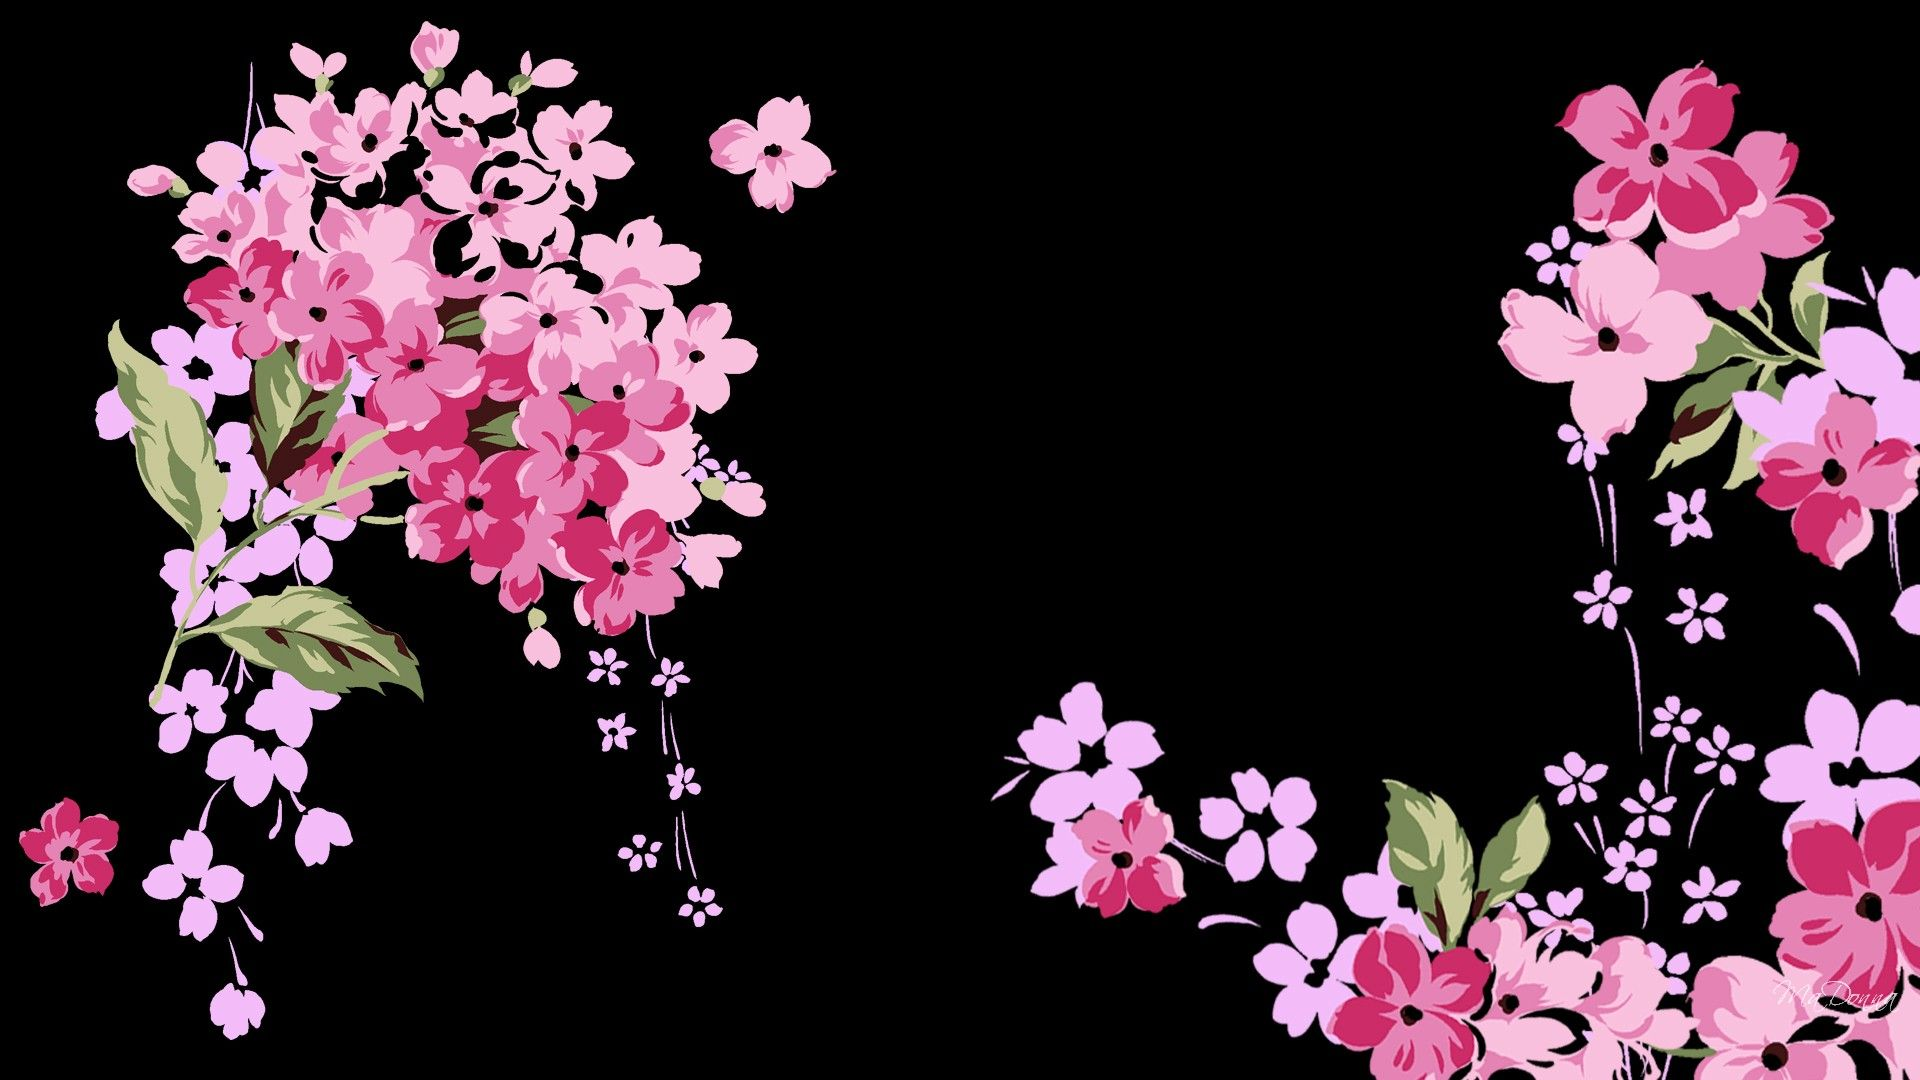 65 Black Floral Desktop Wallpapers   Download at WallpaperBro 1920x1080